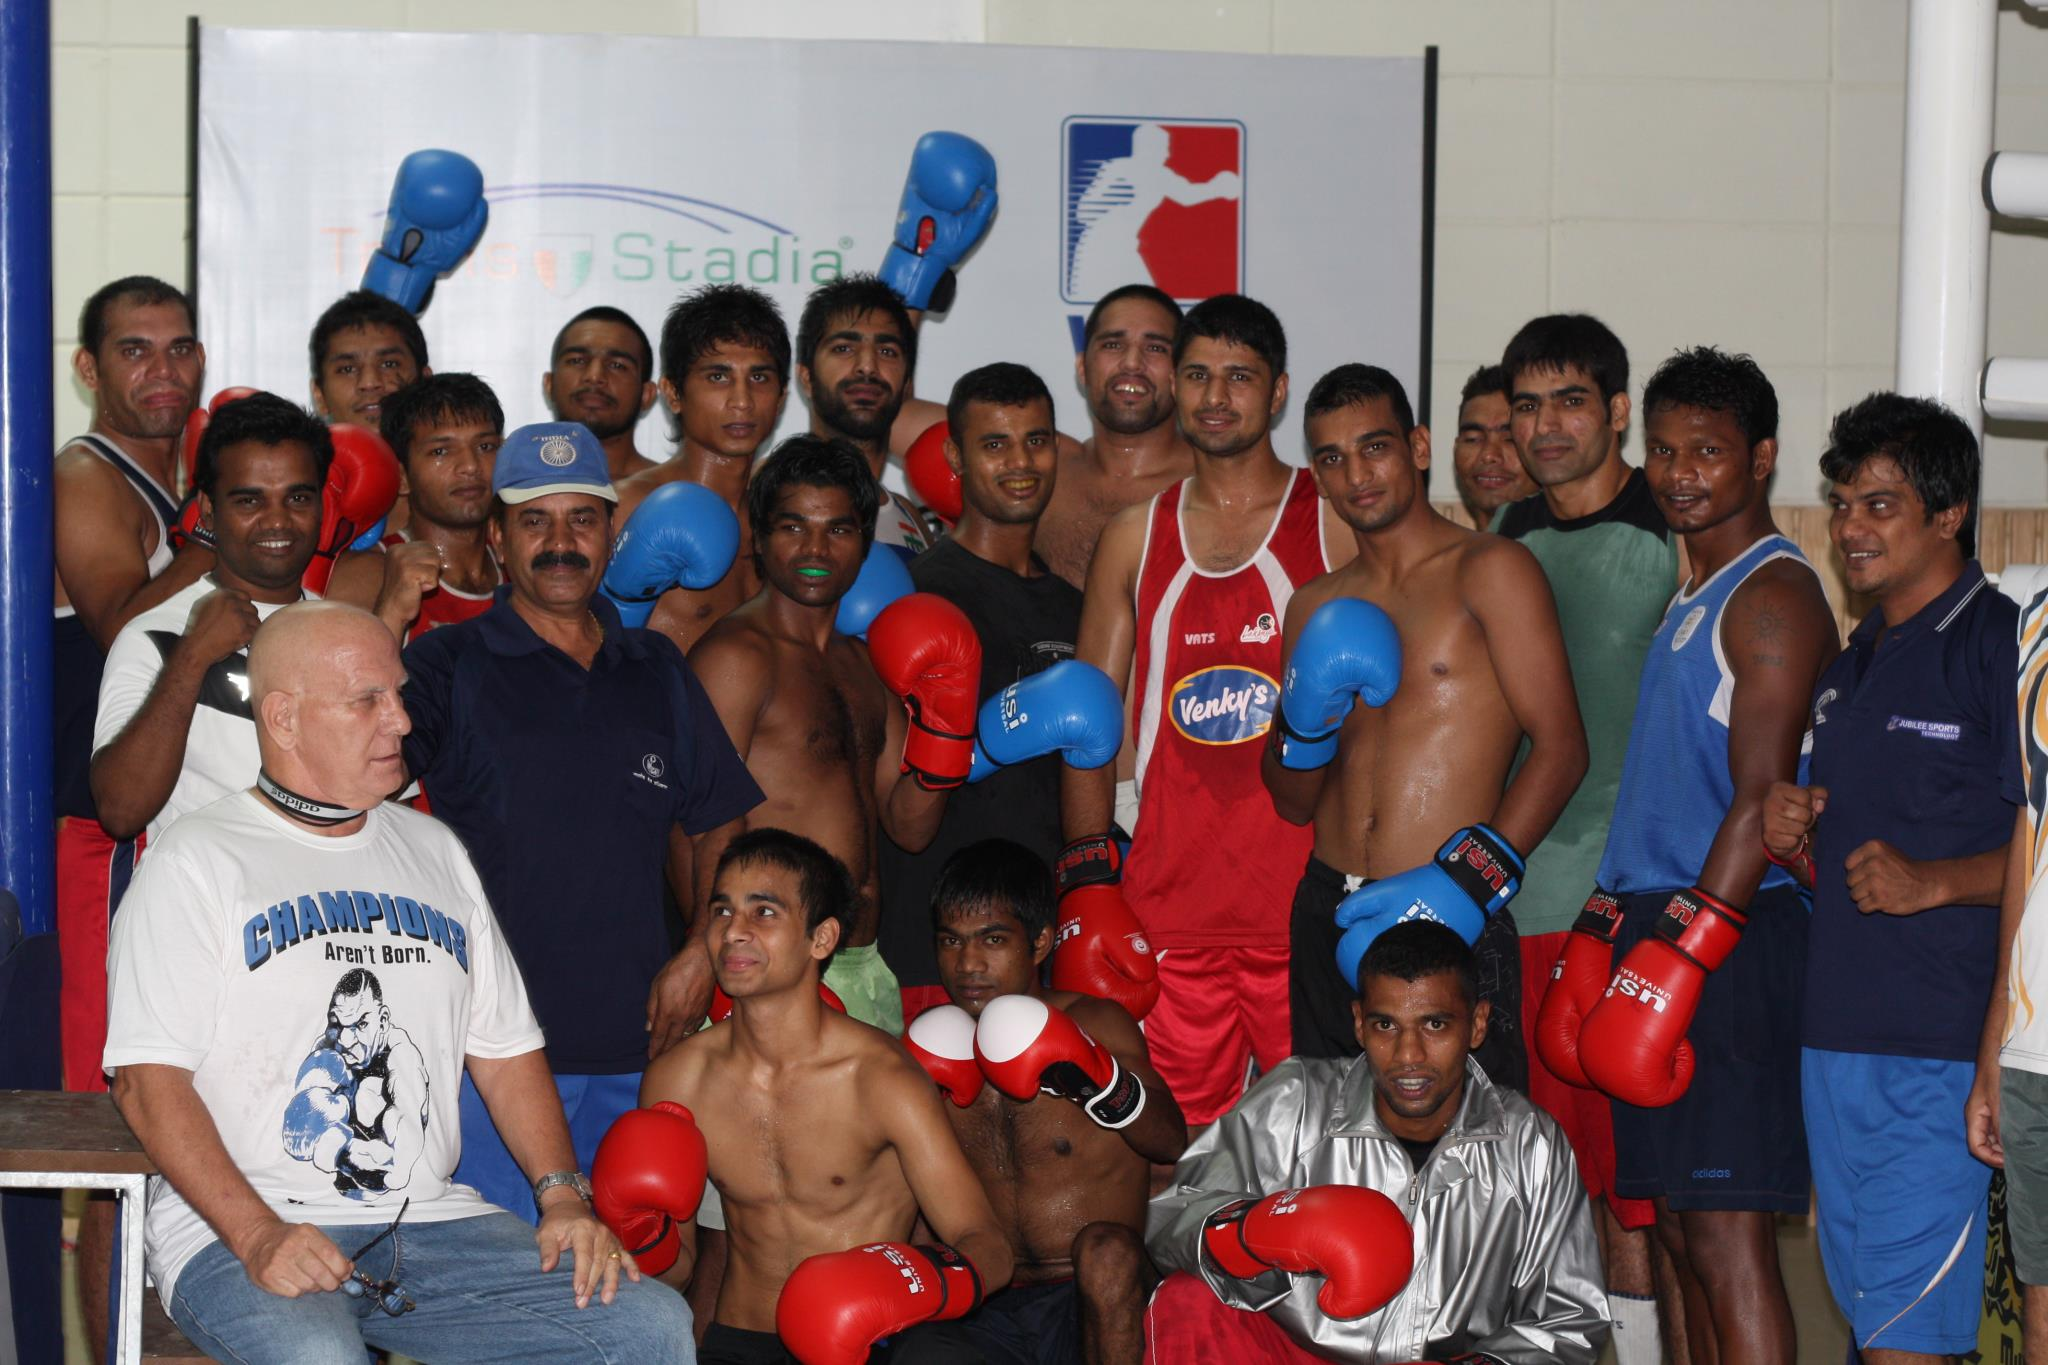 The Mumbai_Fighters_training_camp_in_Balewadi_Pune_with_Technical_Director_Joe_Clough_and_head_coach_Shiv_Kumar_Pal_17-10-11